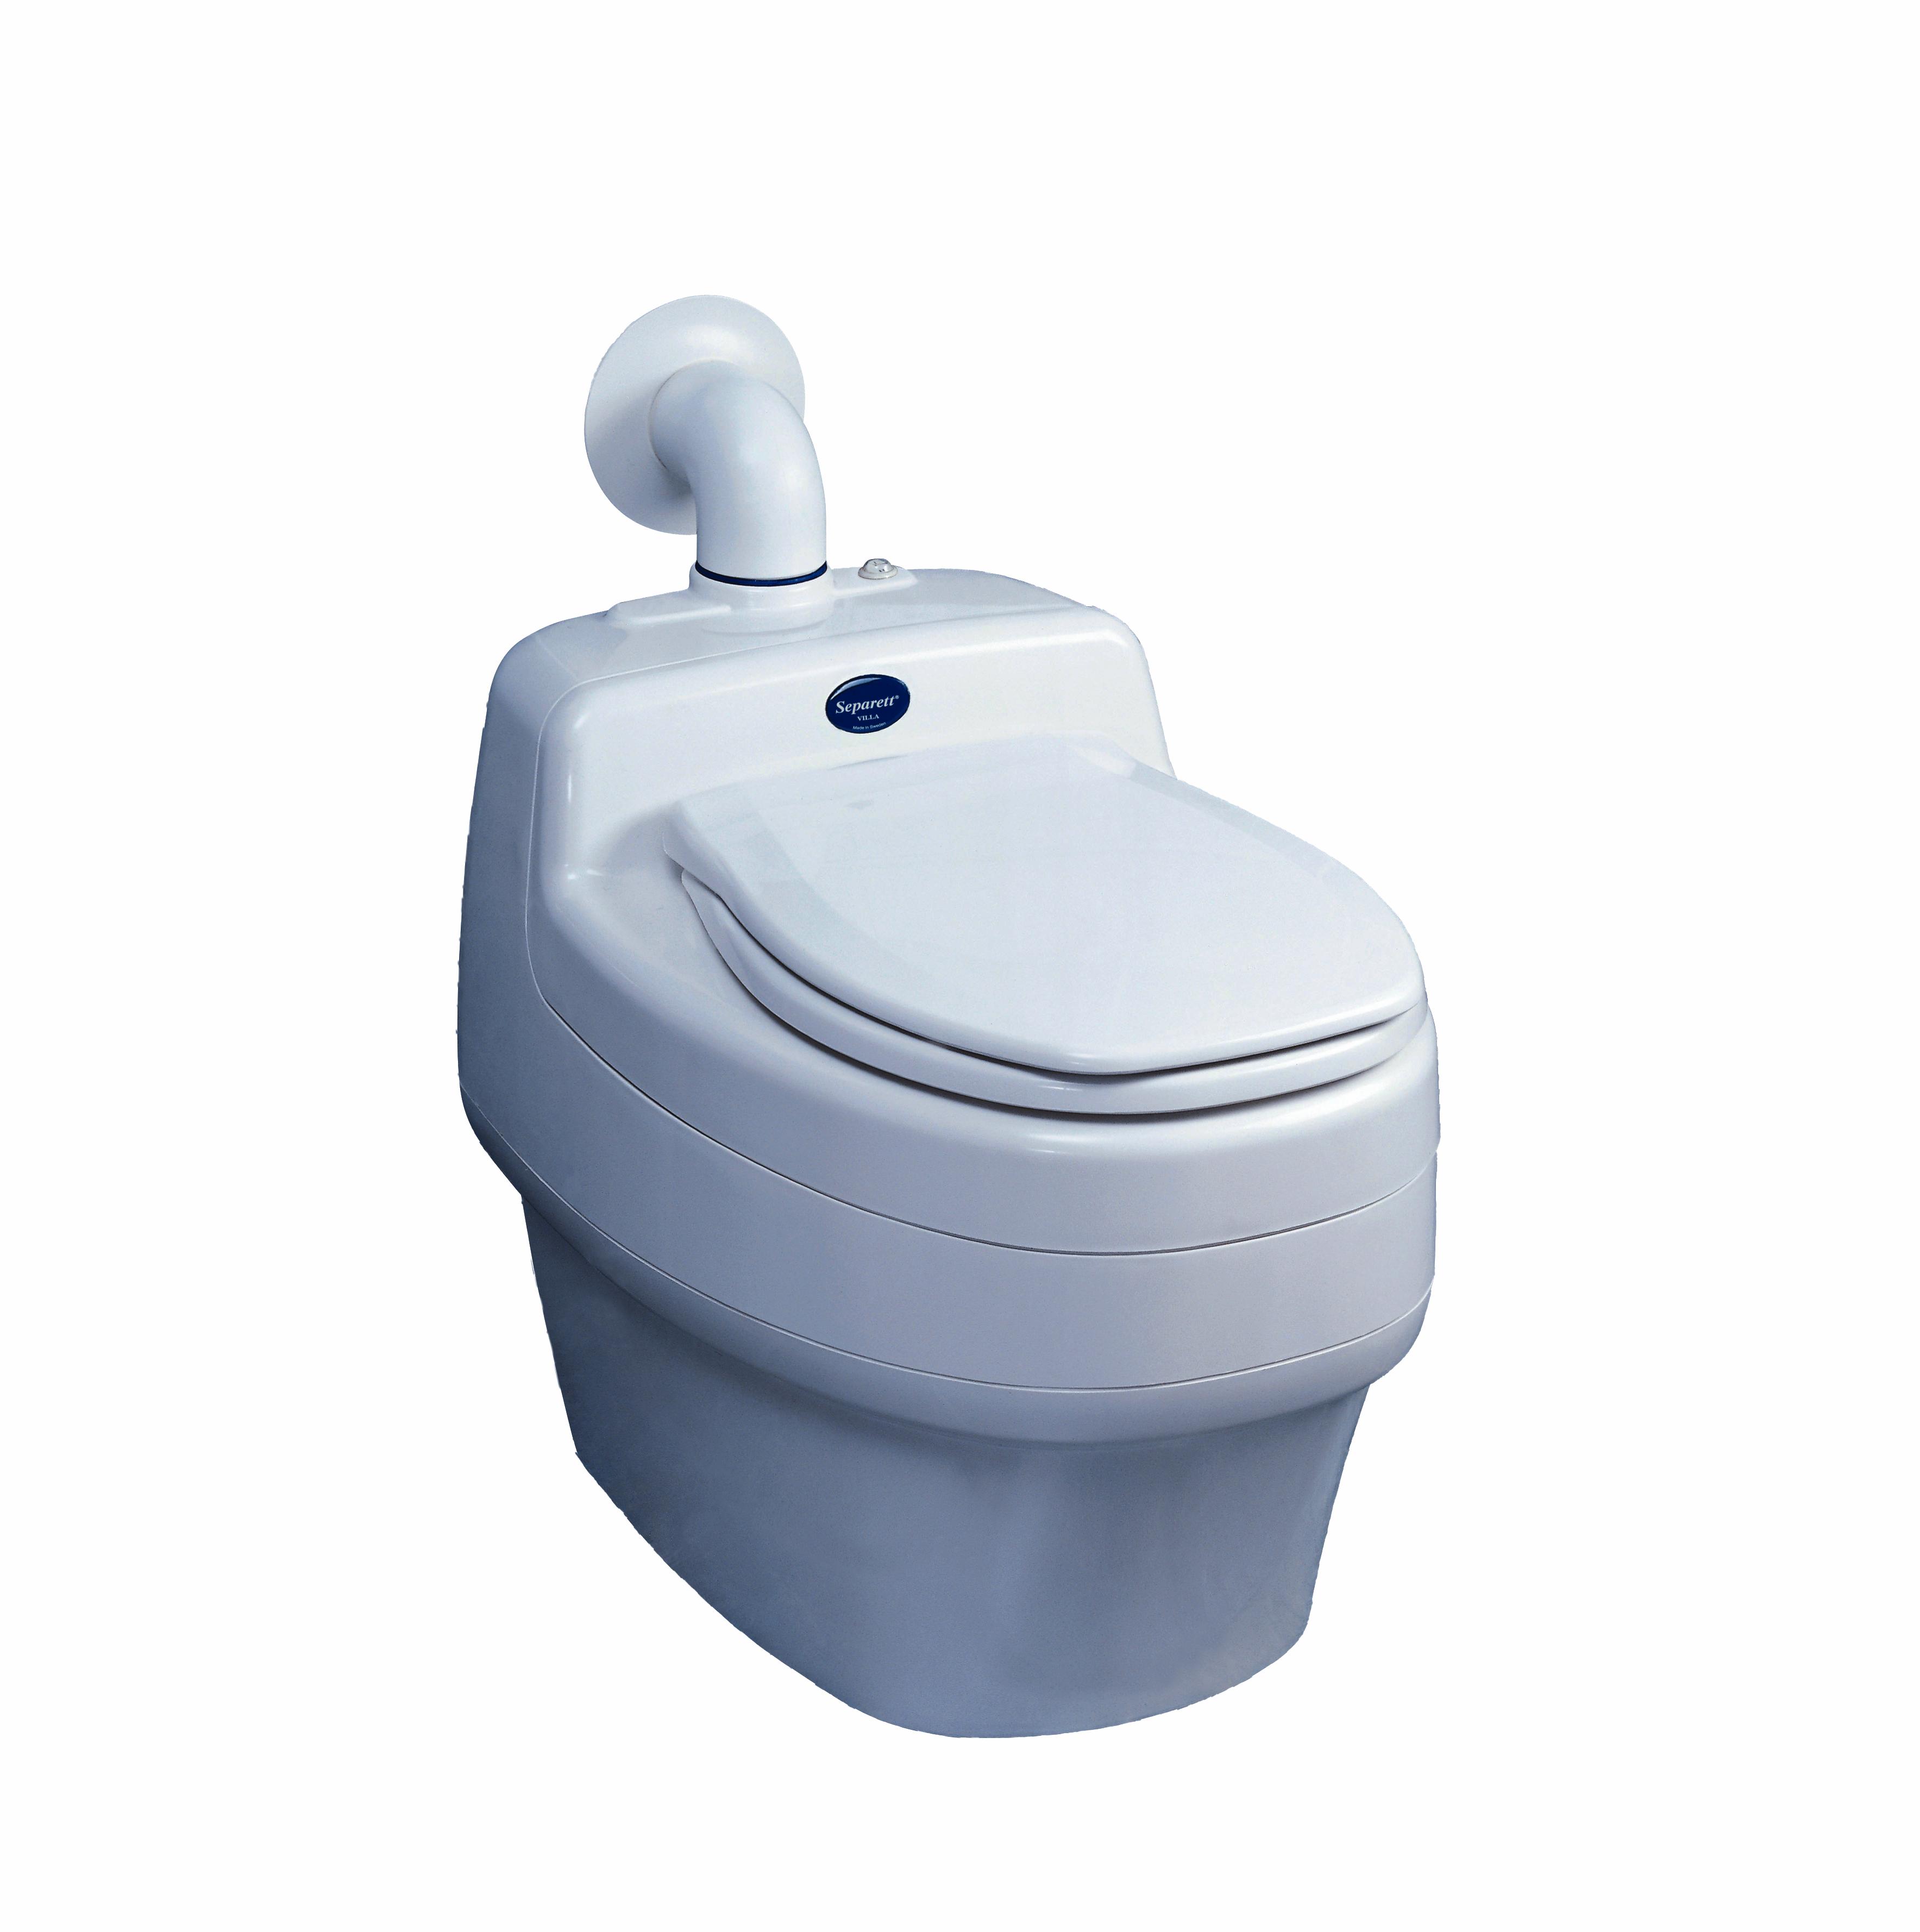 Composting Toilets Canada - Composting Toilets Canada